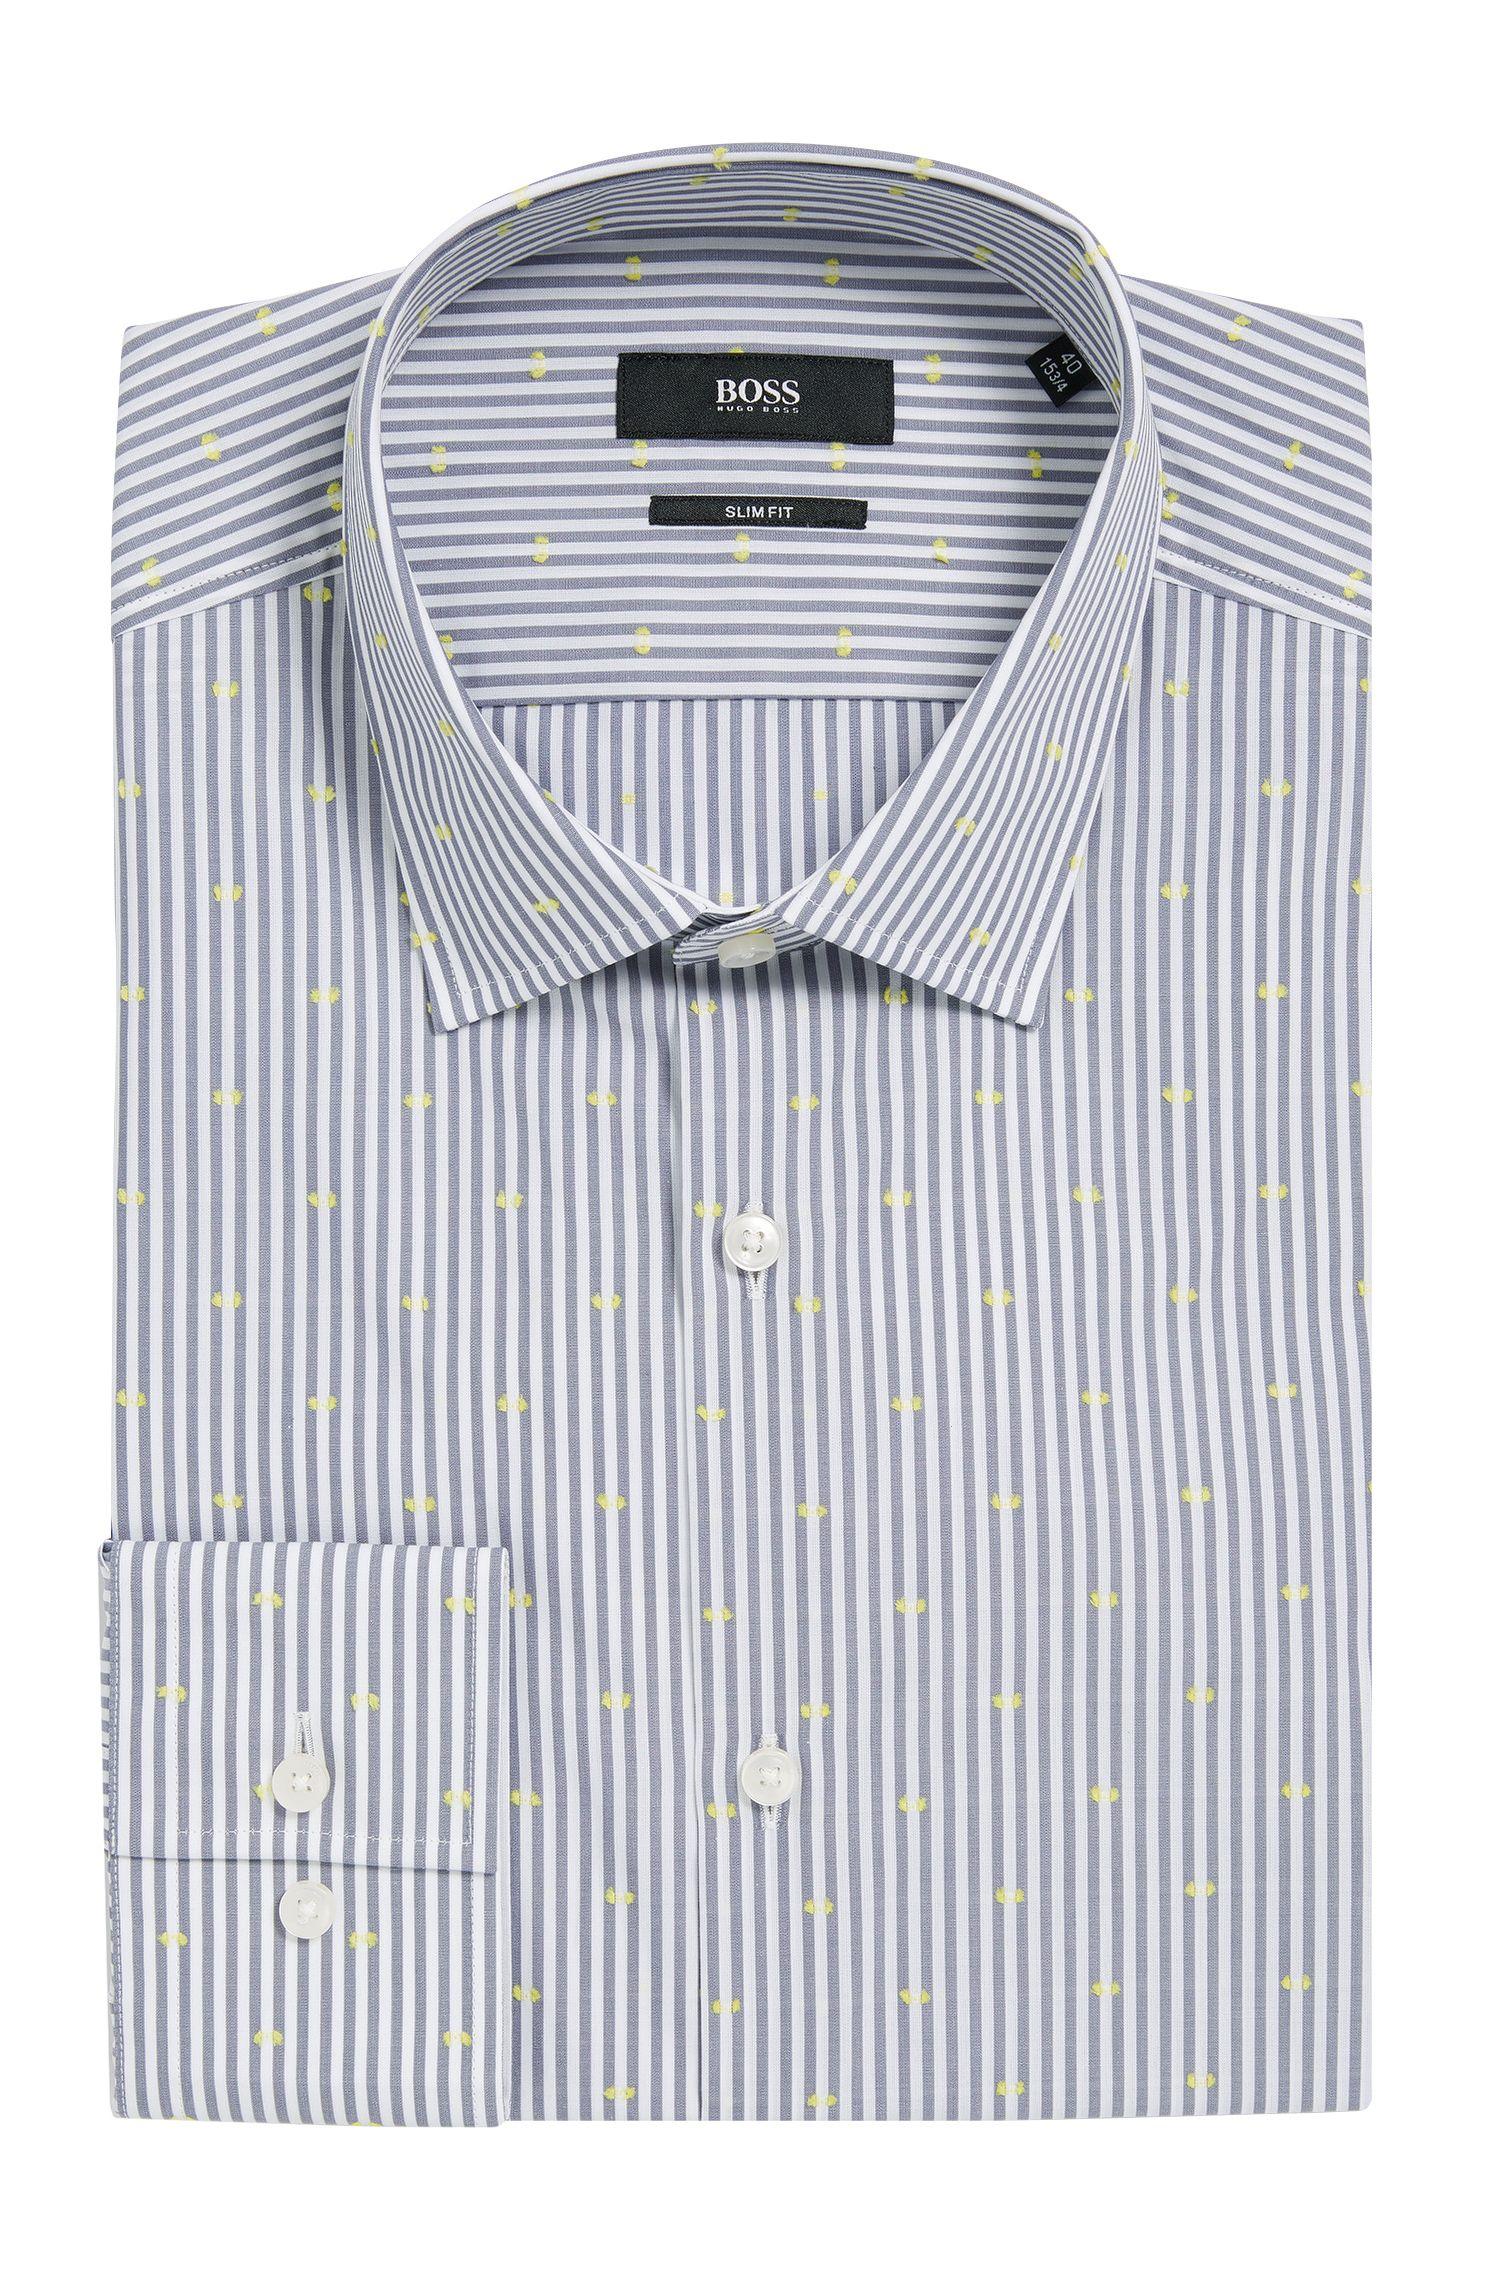 'Jenno' | Slim Fit, Cotton Contrast Textured Dress Shirt